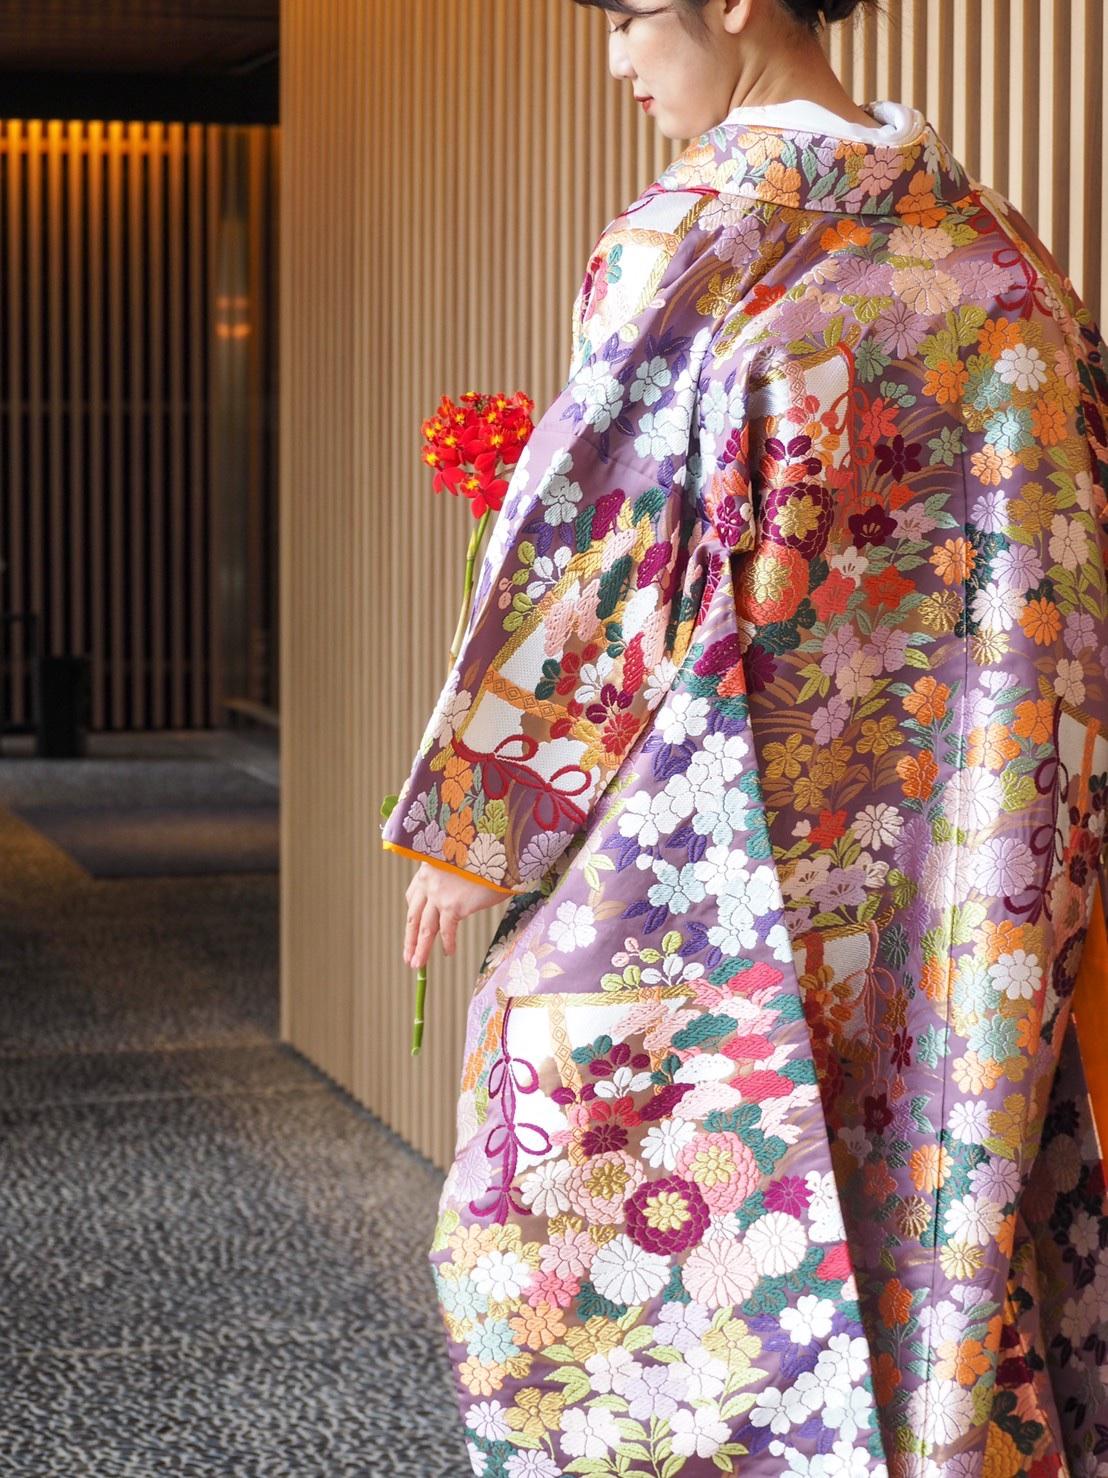 THE TREAT DRESSING神戸店にてお取り扱いのある几帳の柄が美しい紫色の色打掛のご紹介